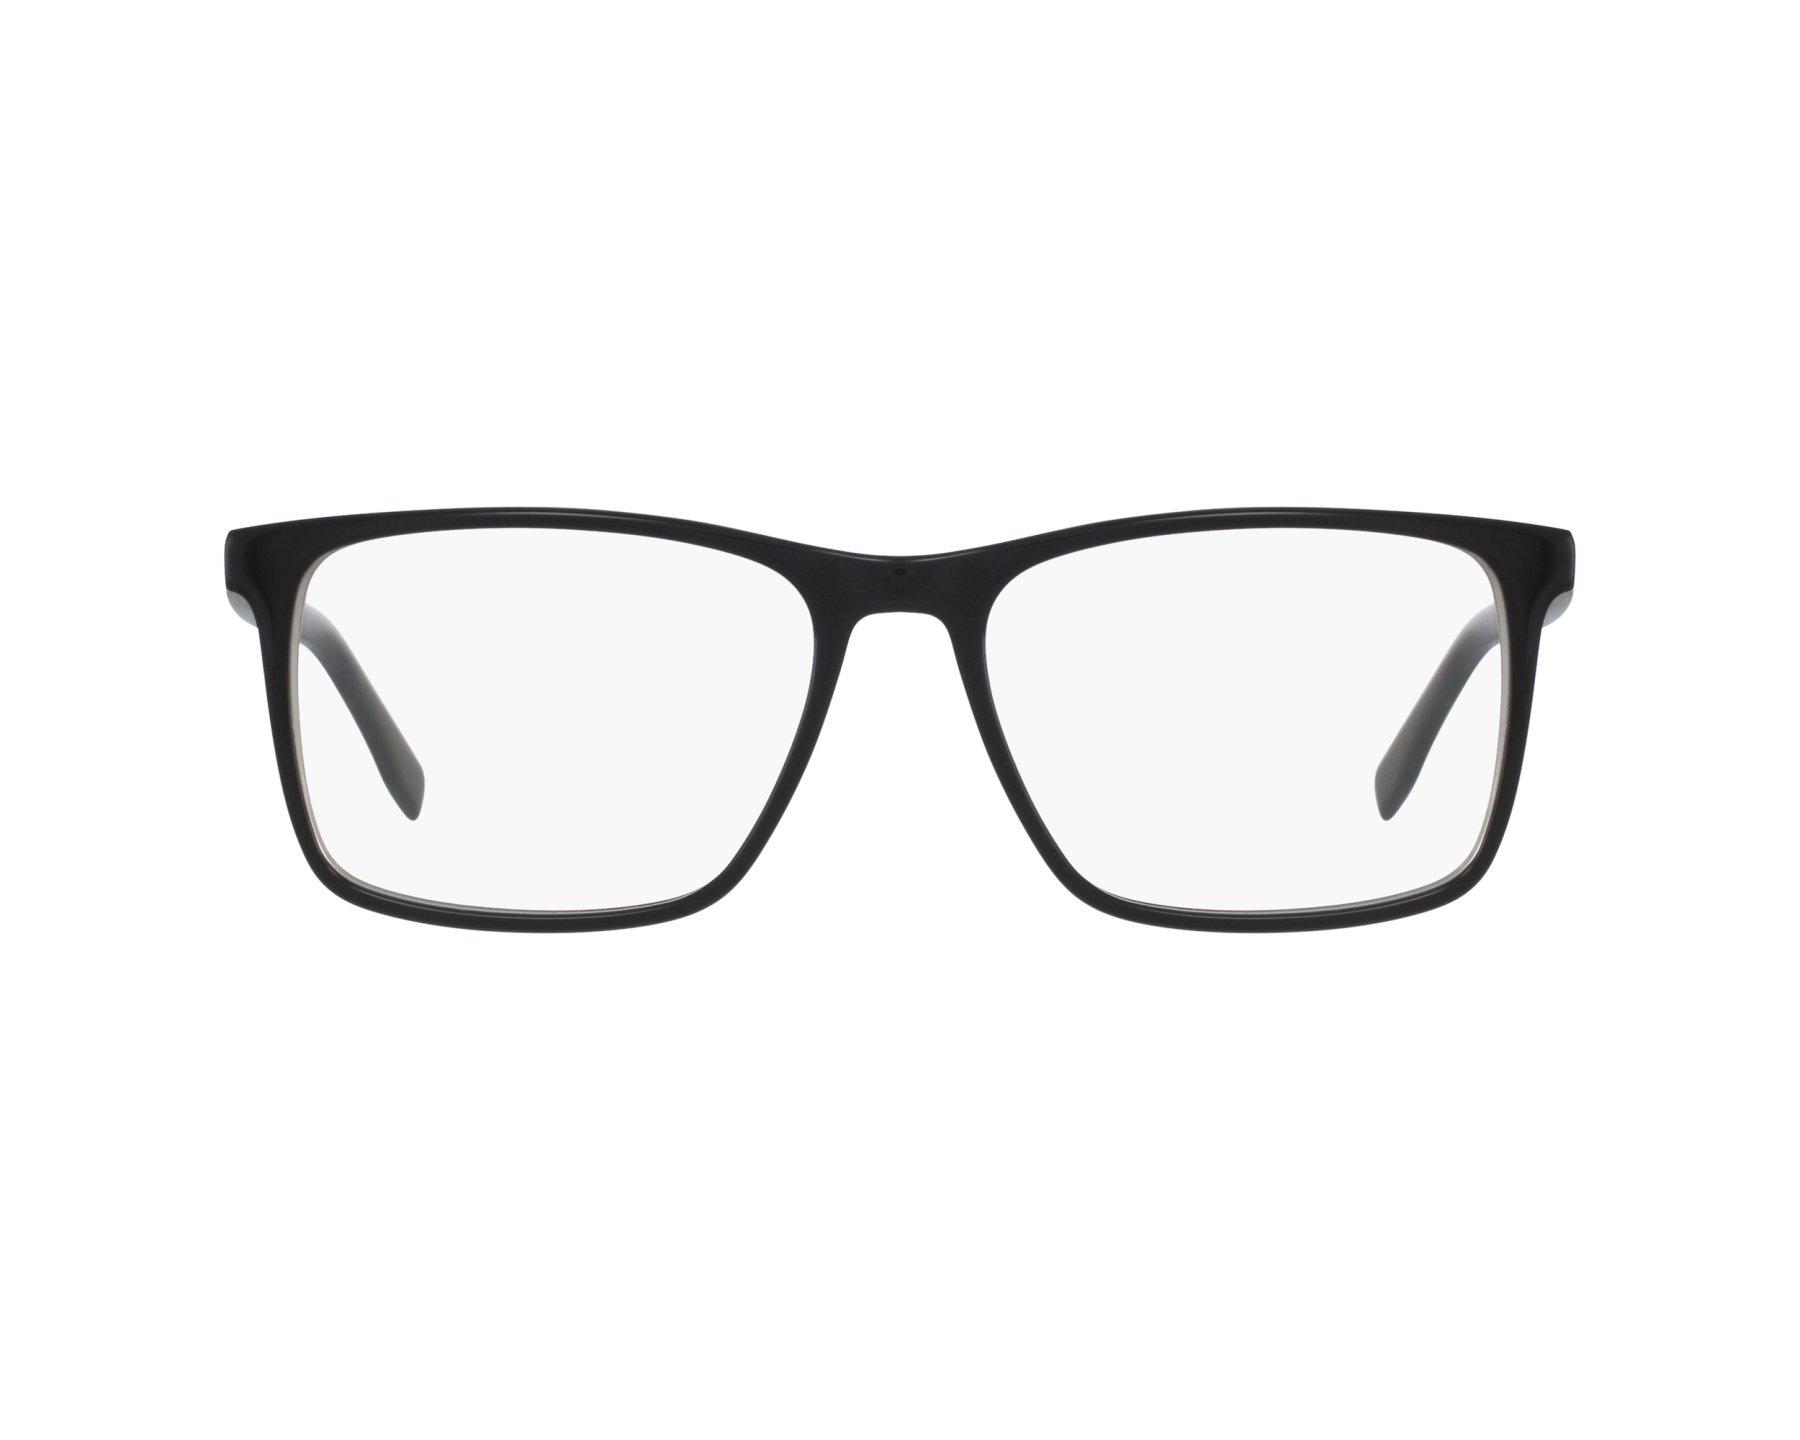 Hugo Boss Eyeglasses Black BOSS-0764 QHI - Visionet US